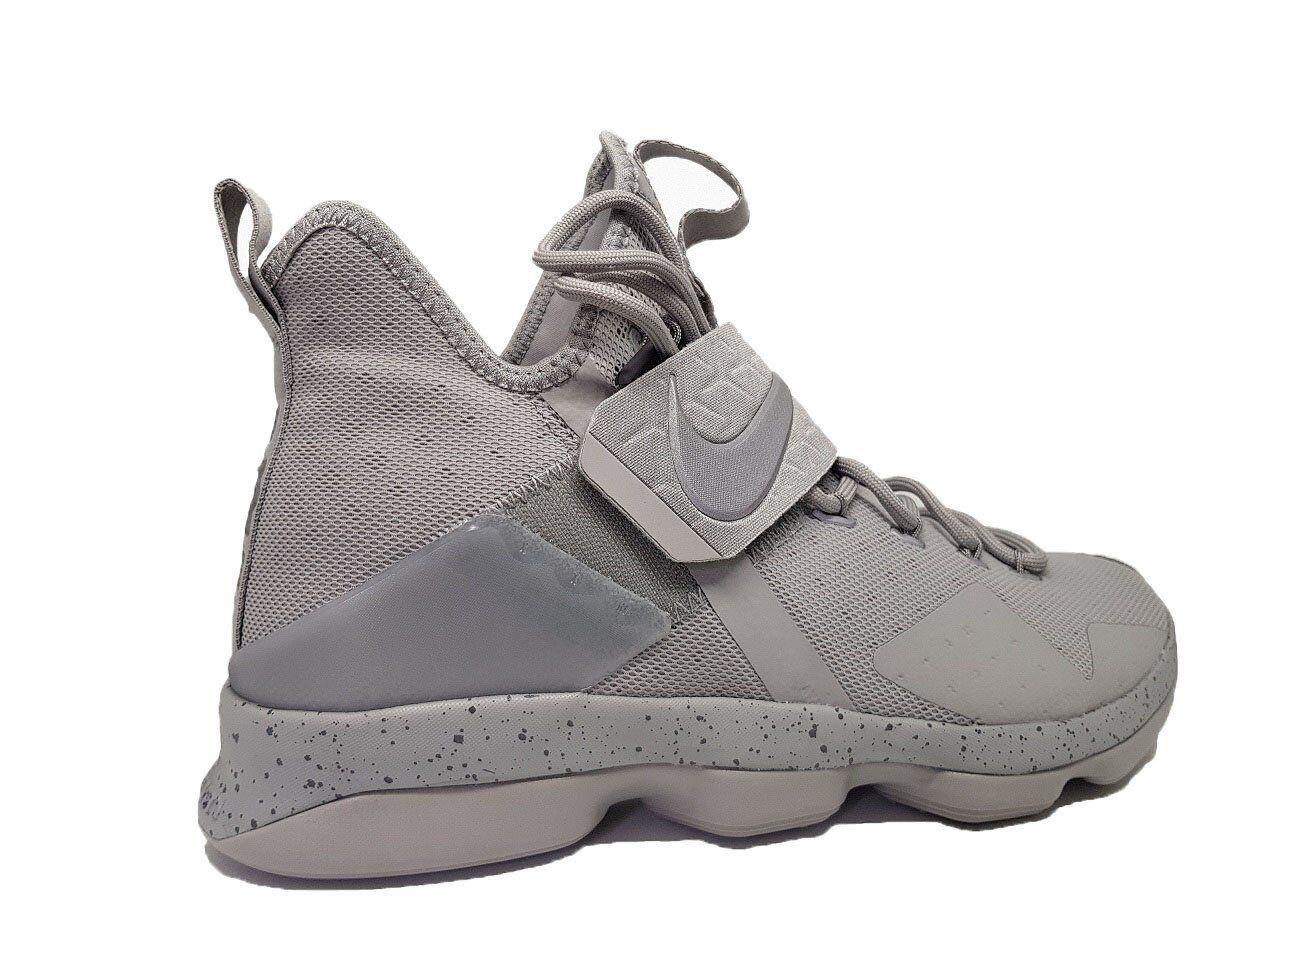 pretty nice 5ed0e 78b82 ... Men s LeBron XIV Basketball Shoes, Shoes, Shoes, 852405 007  Silver Reflect Silver